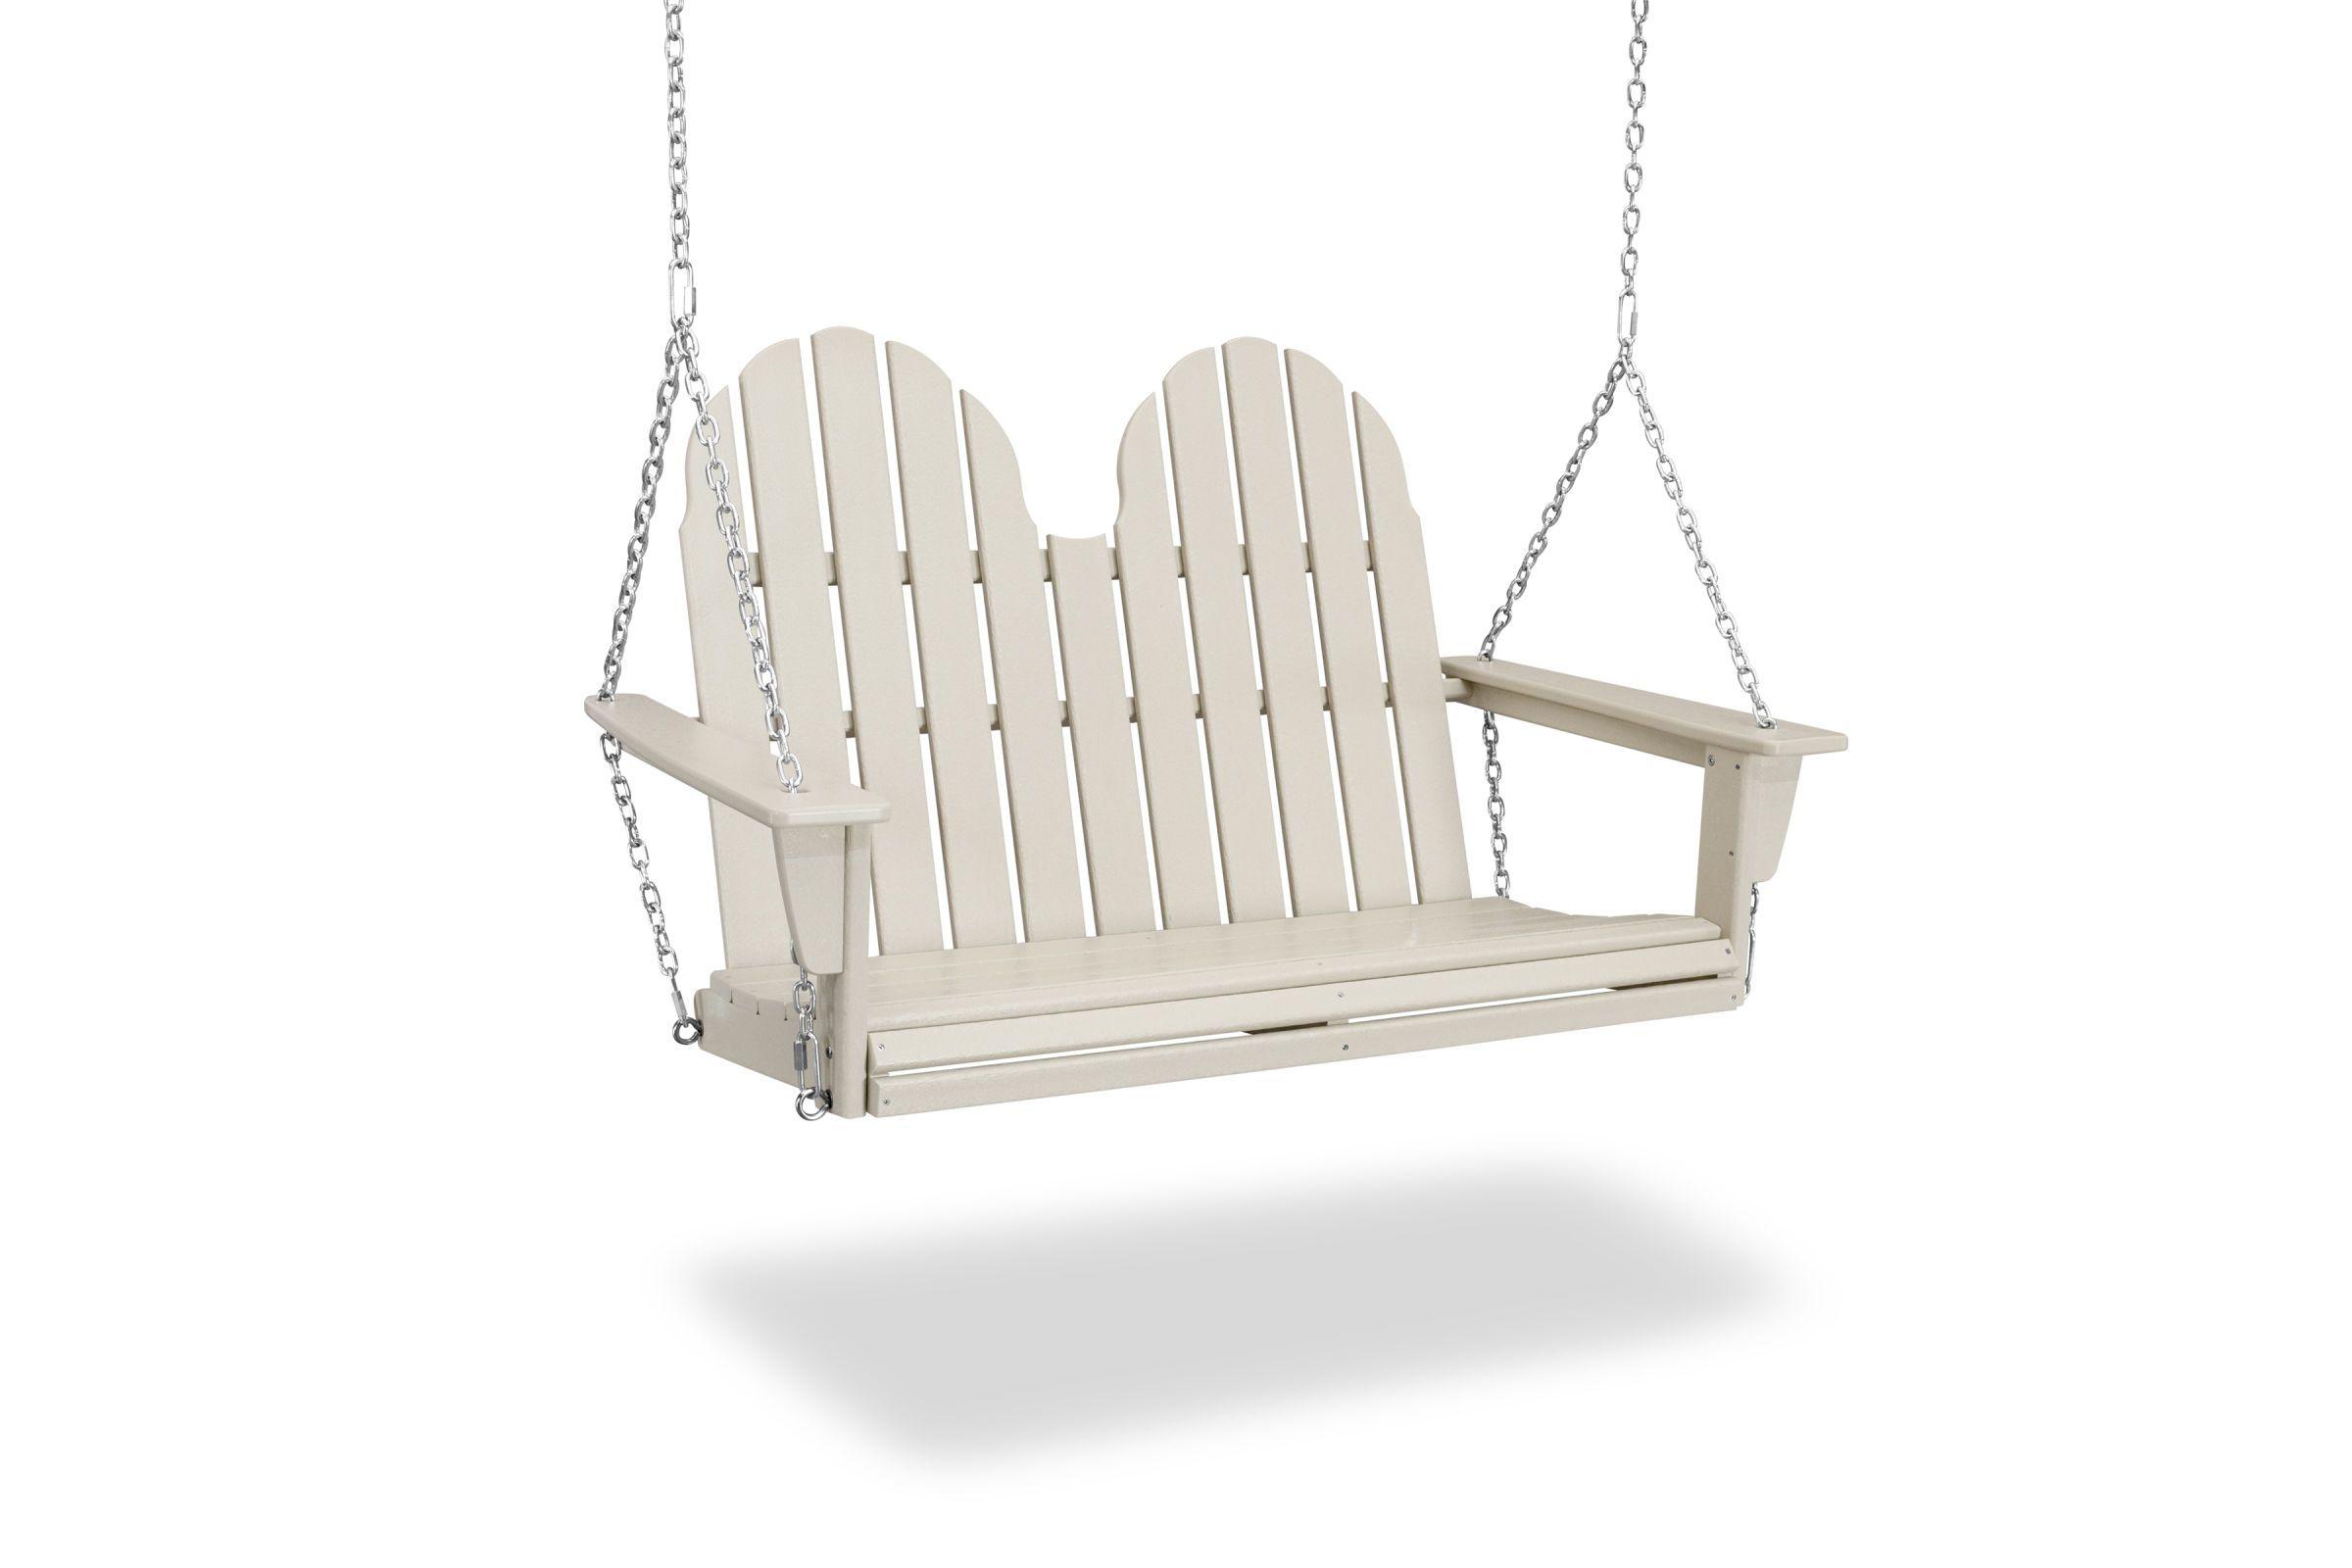 "Most Recently Released Vineyard Adirondack 48"" Swing Adsw600 Regarding Vineyard Porch Swings (View 17 of 25)"